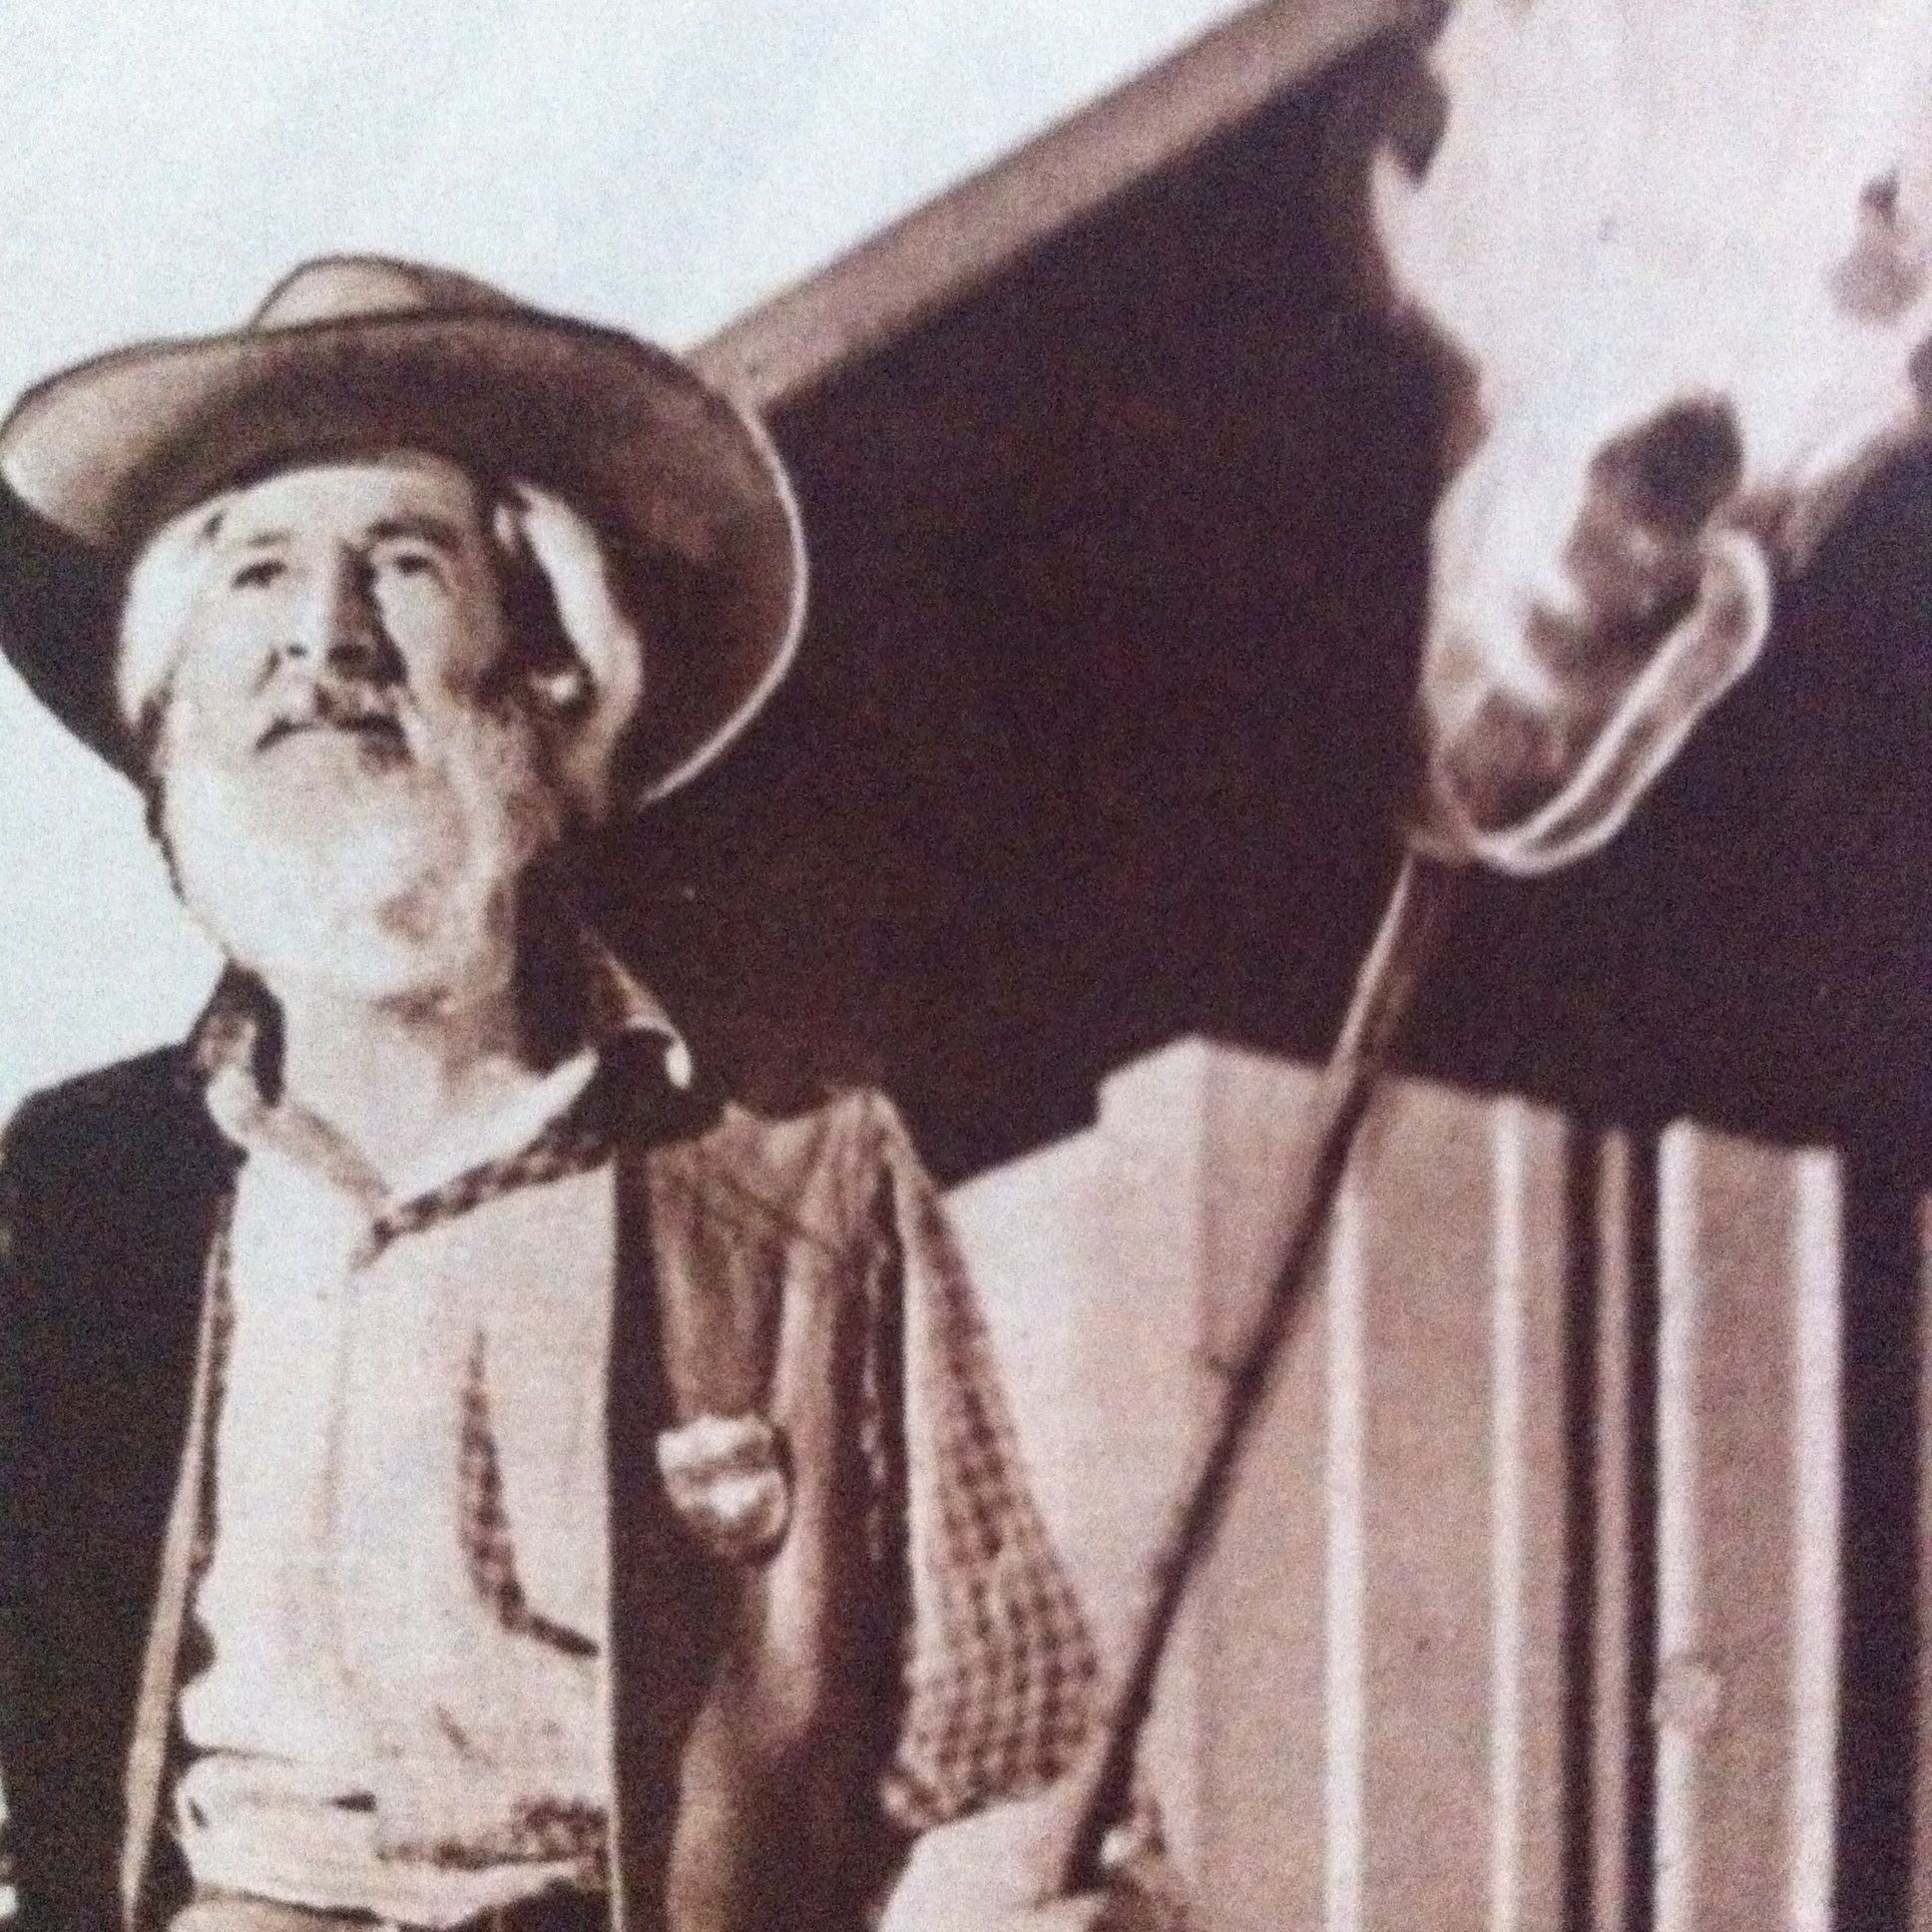 George 'Gabby' Hayes in Trail Street (1947)